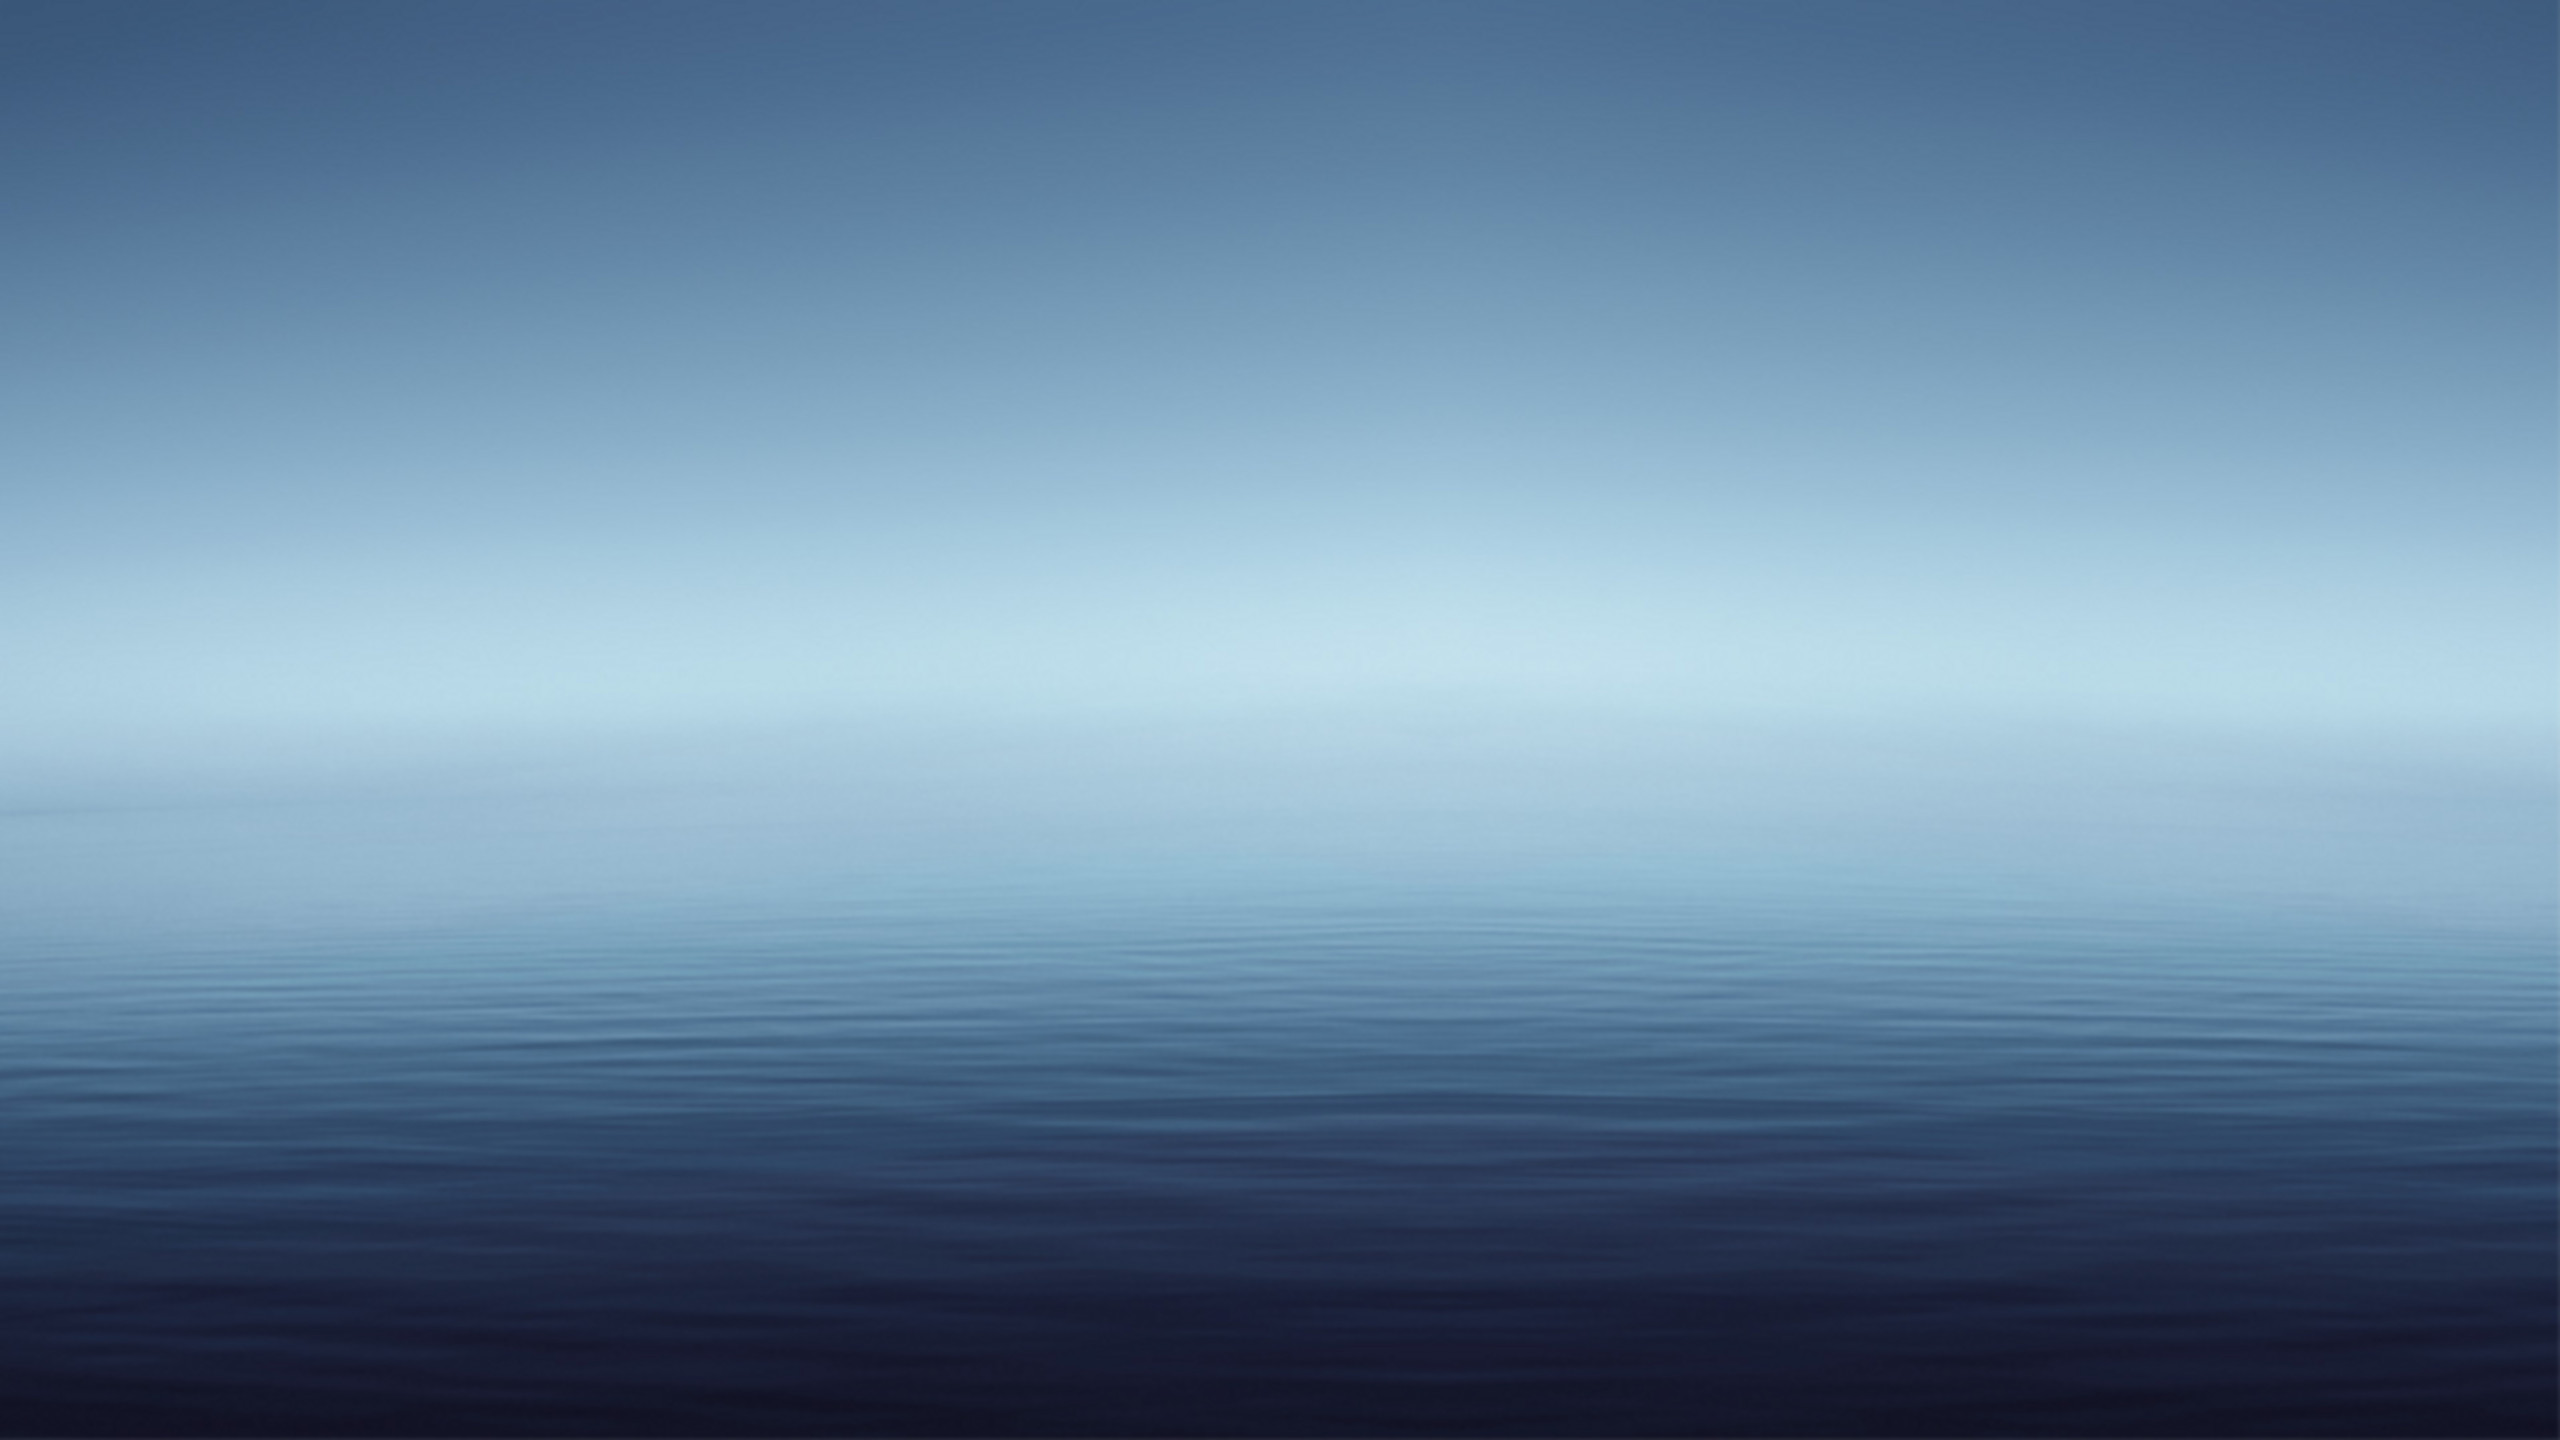 Wallpaper-iOS-6-by-Lorde-Renan